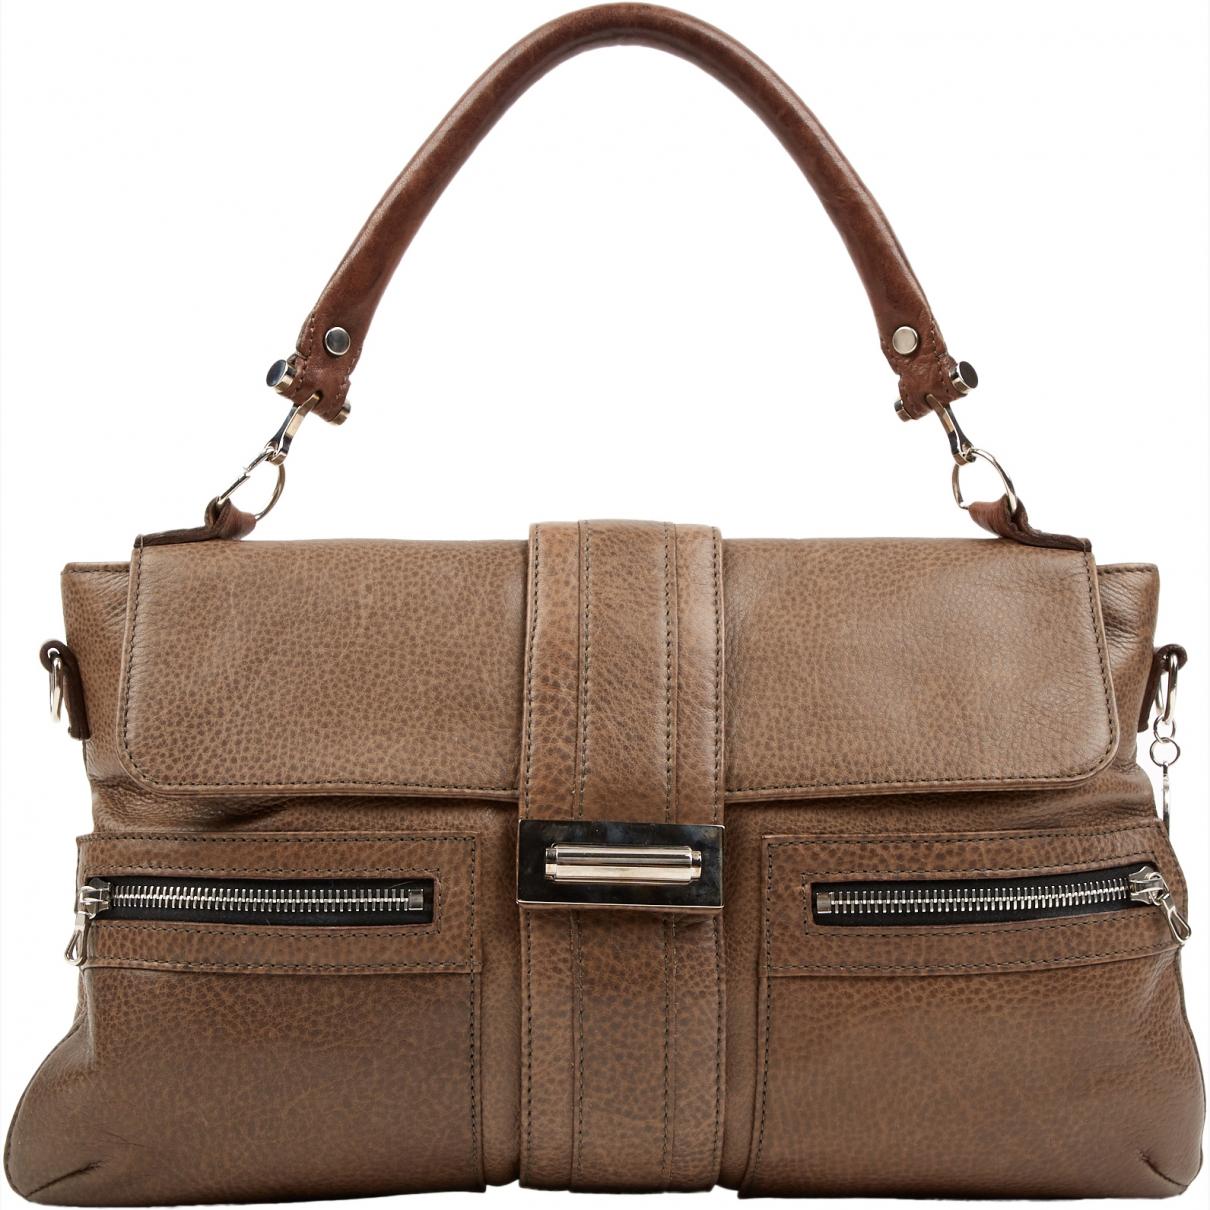 Lanvin \N Brown Leather handbag for Women \N